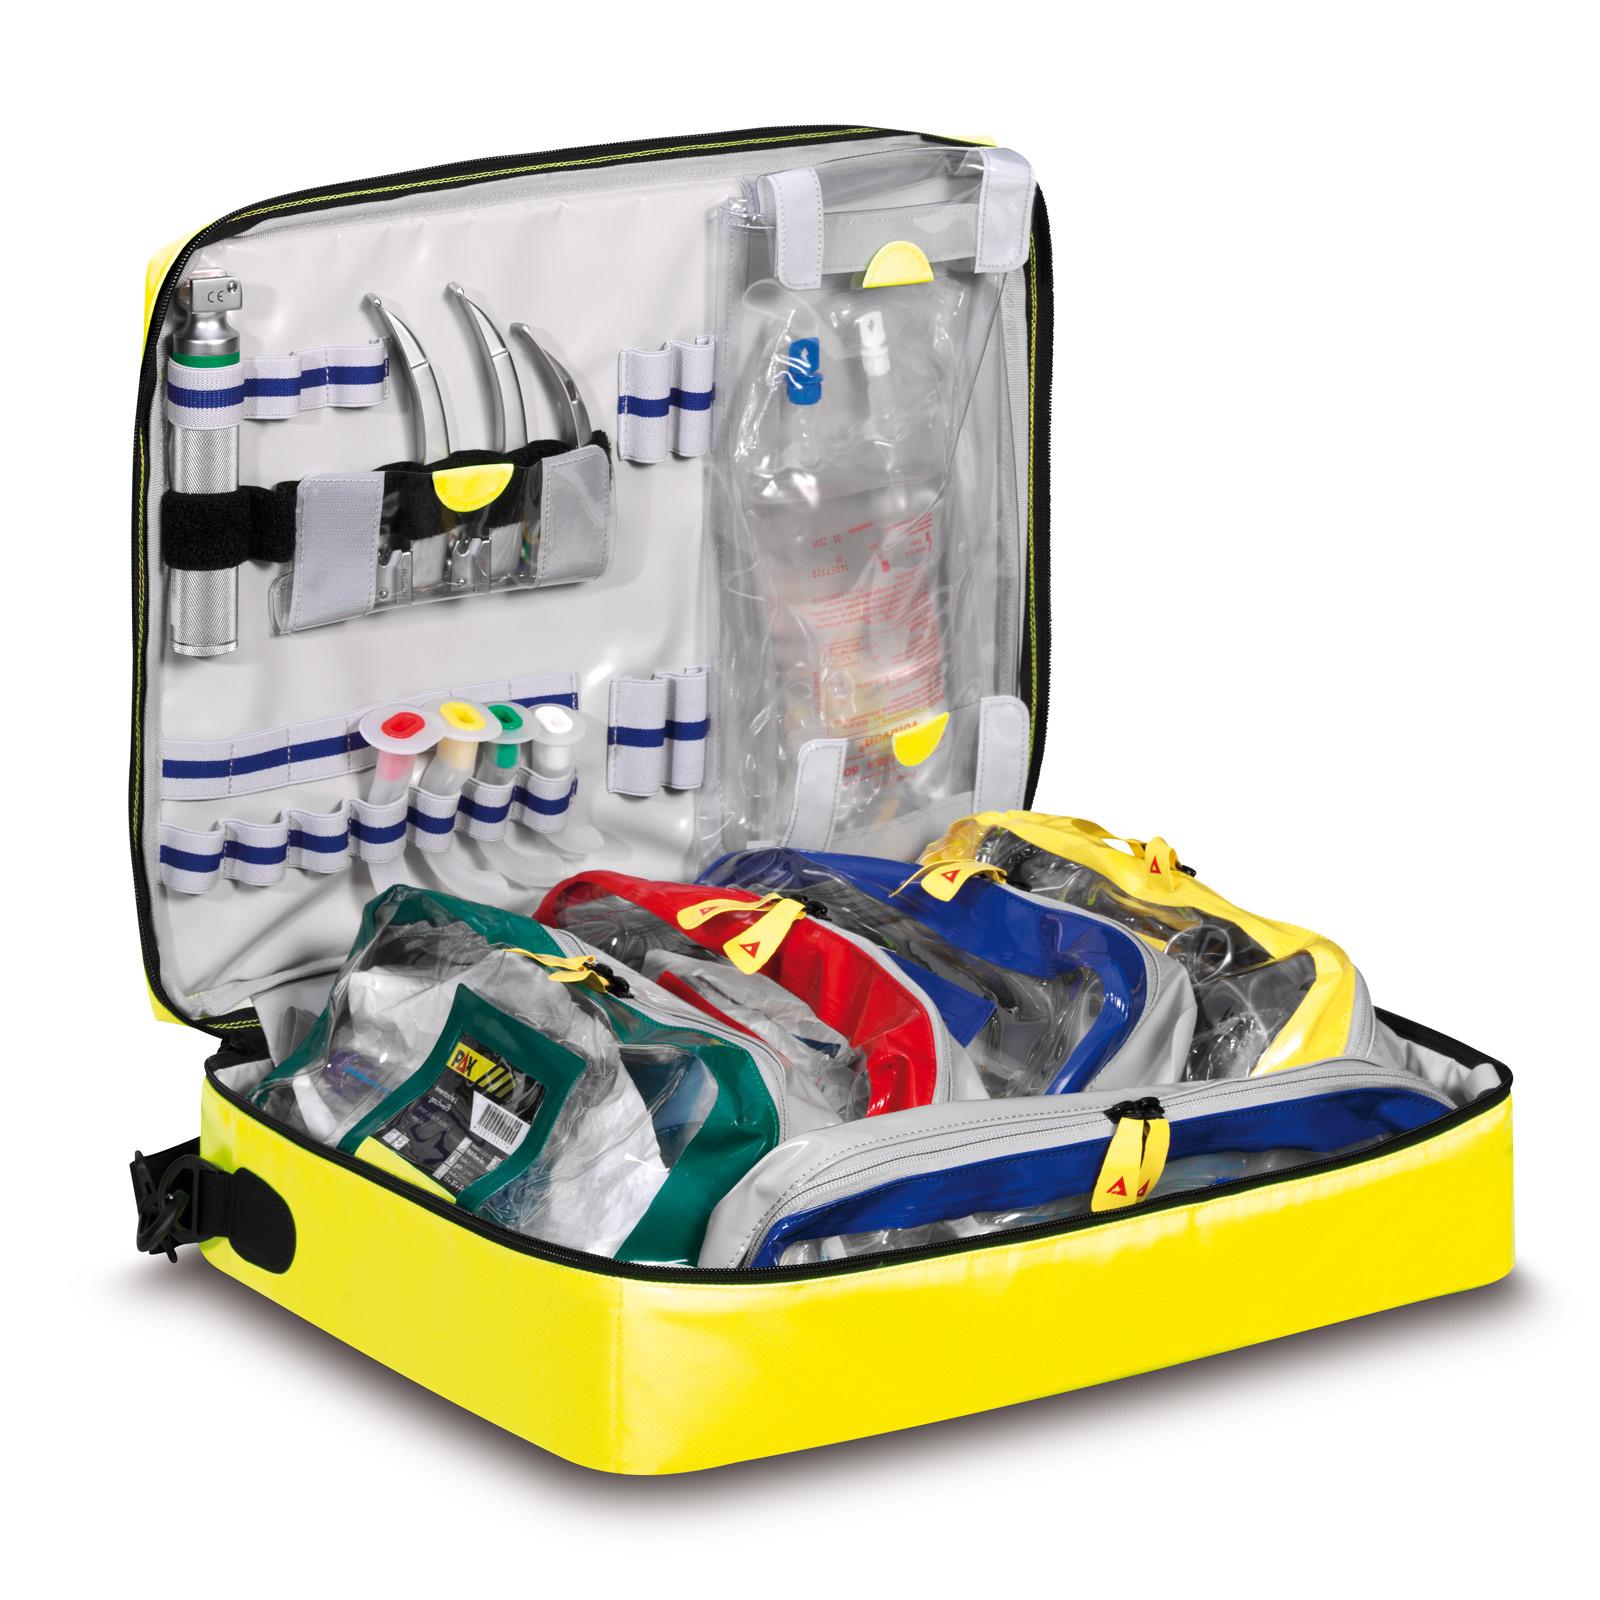 Child emergency pack Pax-plan